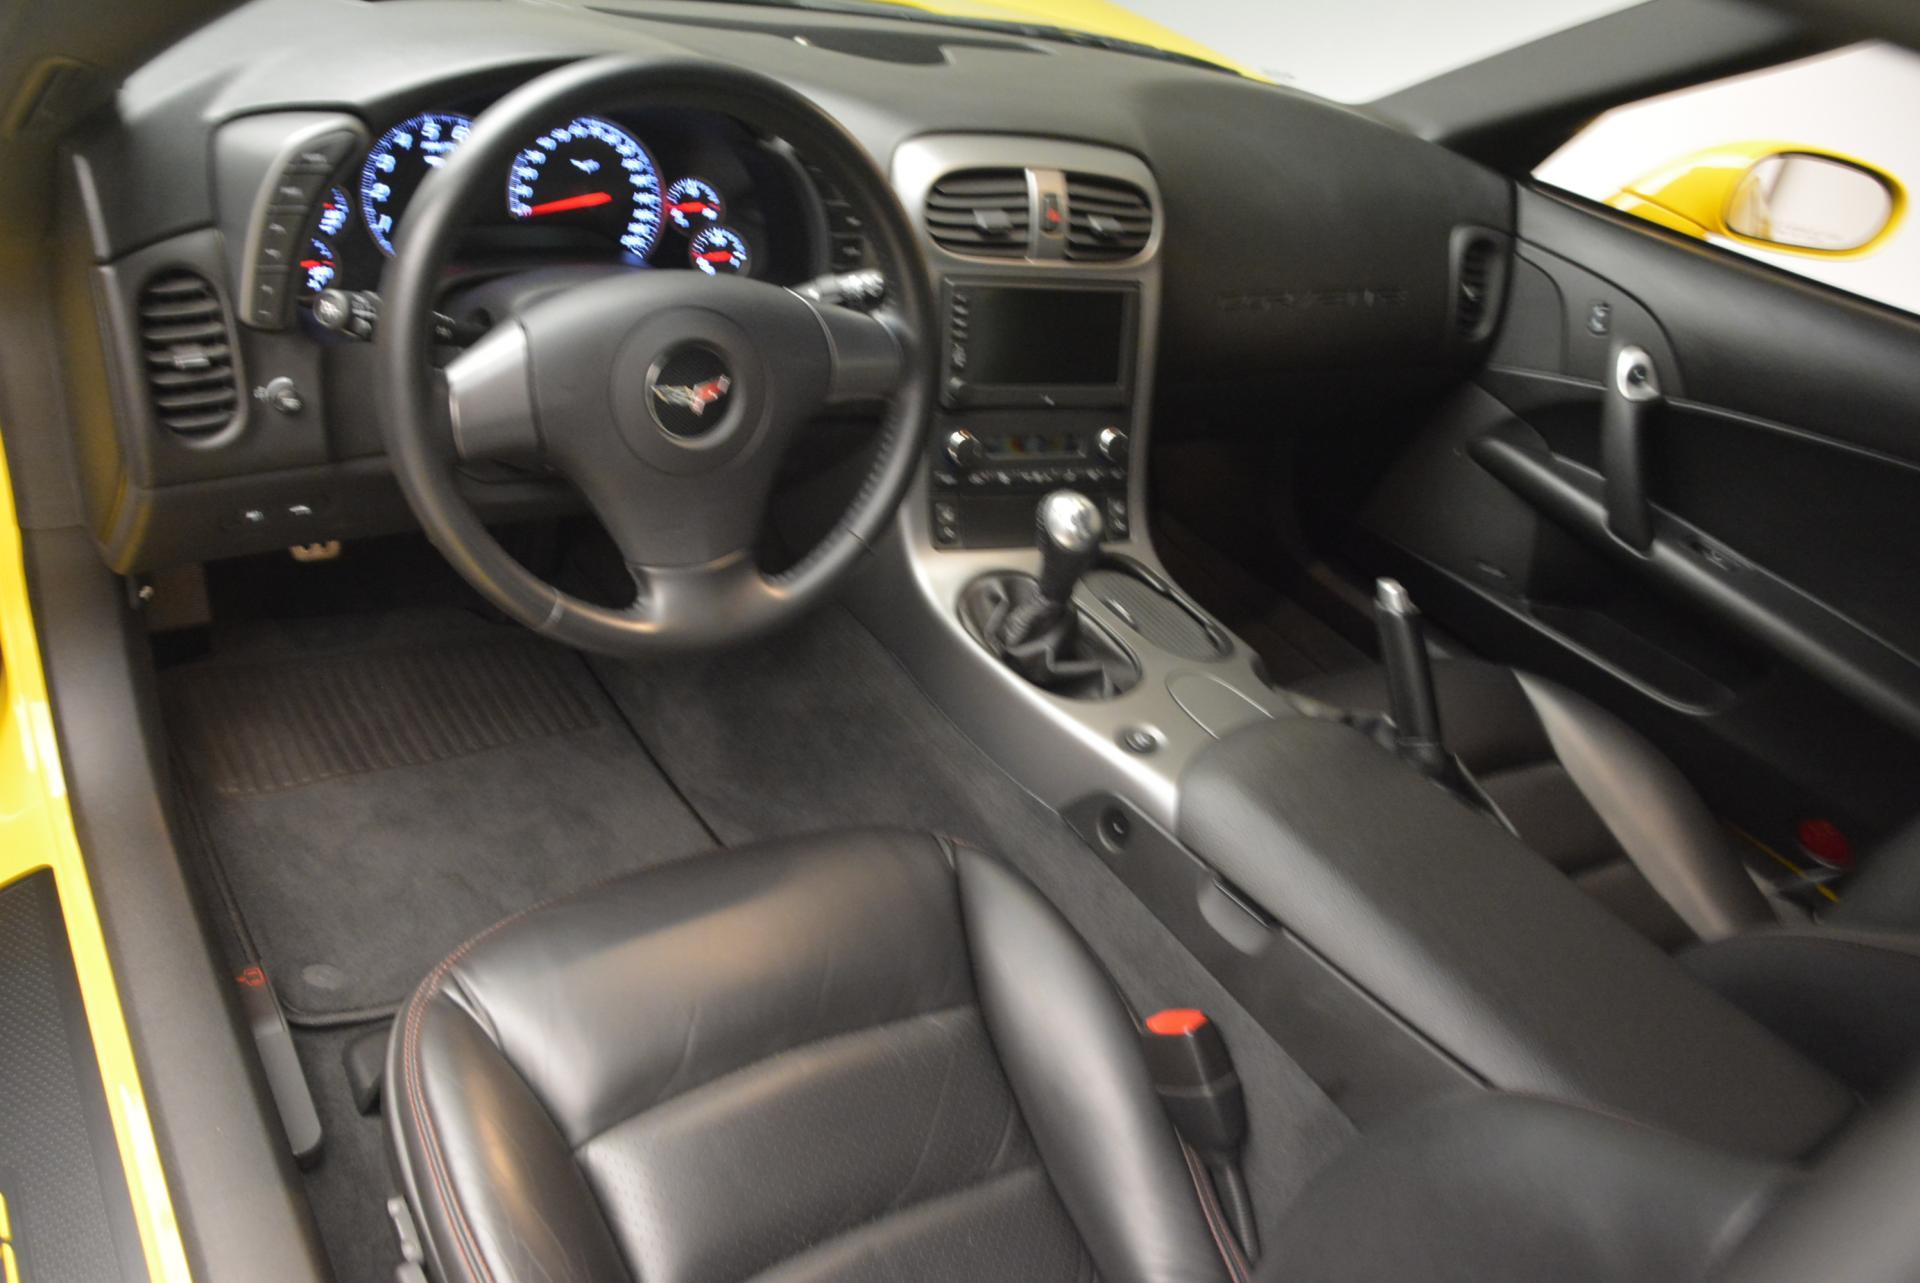 Used 2006 Chevrolet Corvette Z06 Hardtop For Sale In Greenwich, CT 530_p12